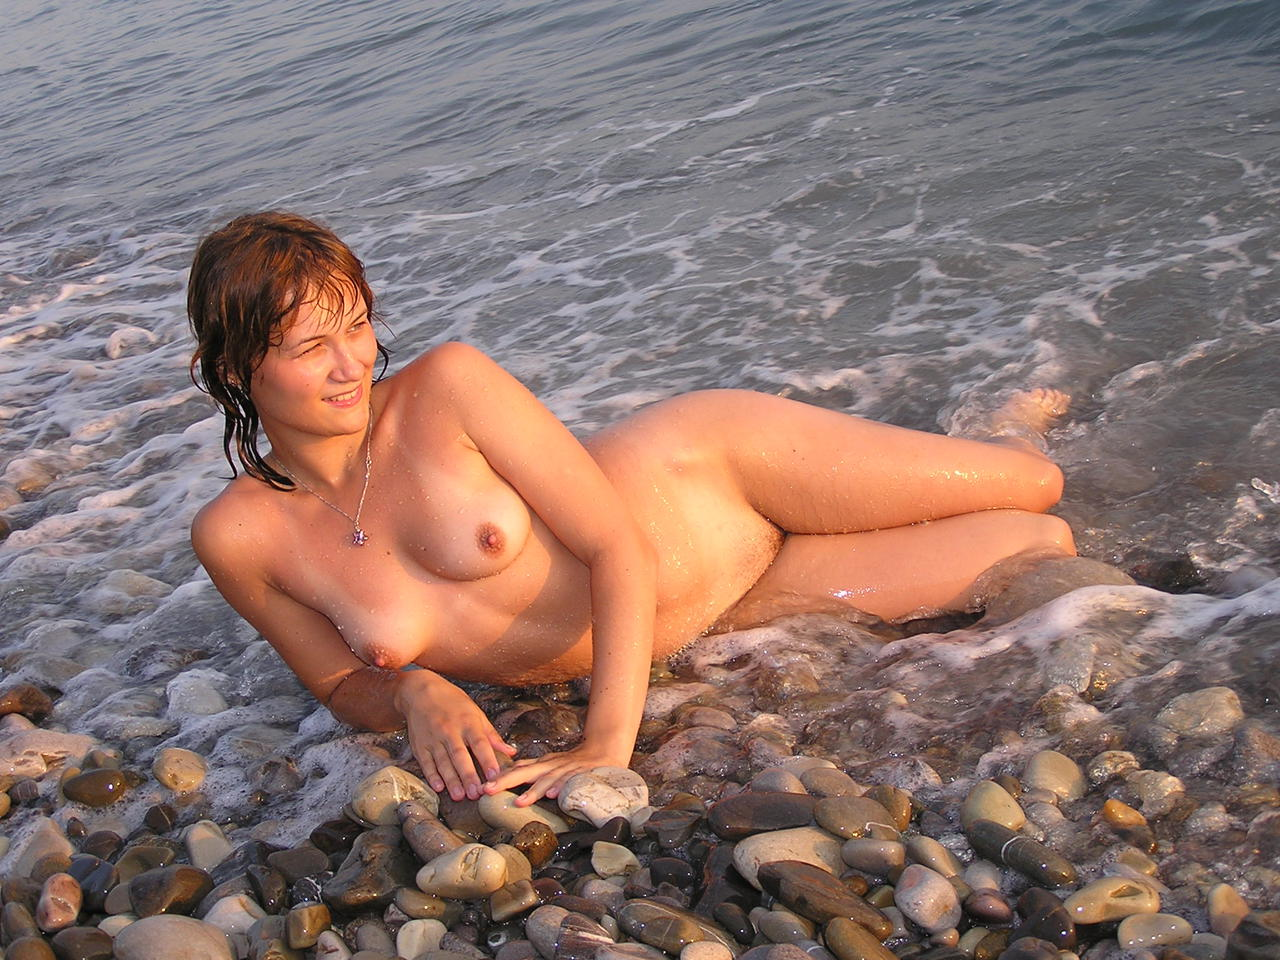 Women letting men come on tits pics